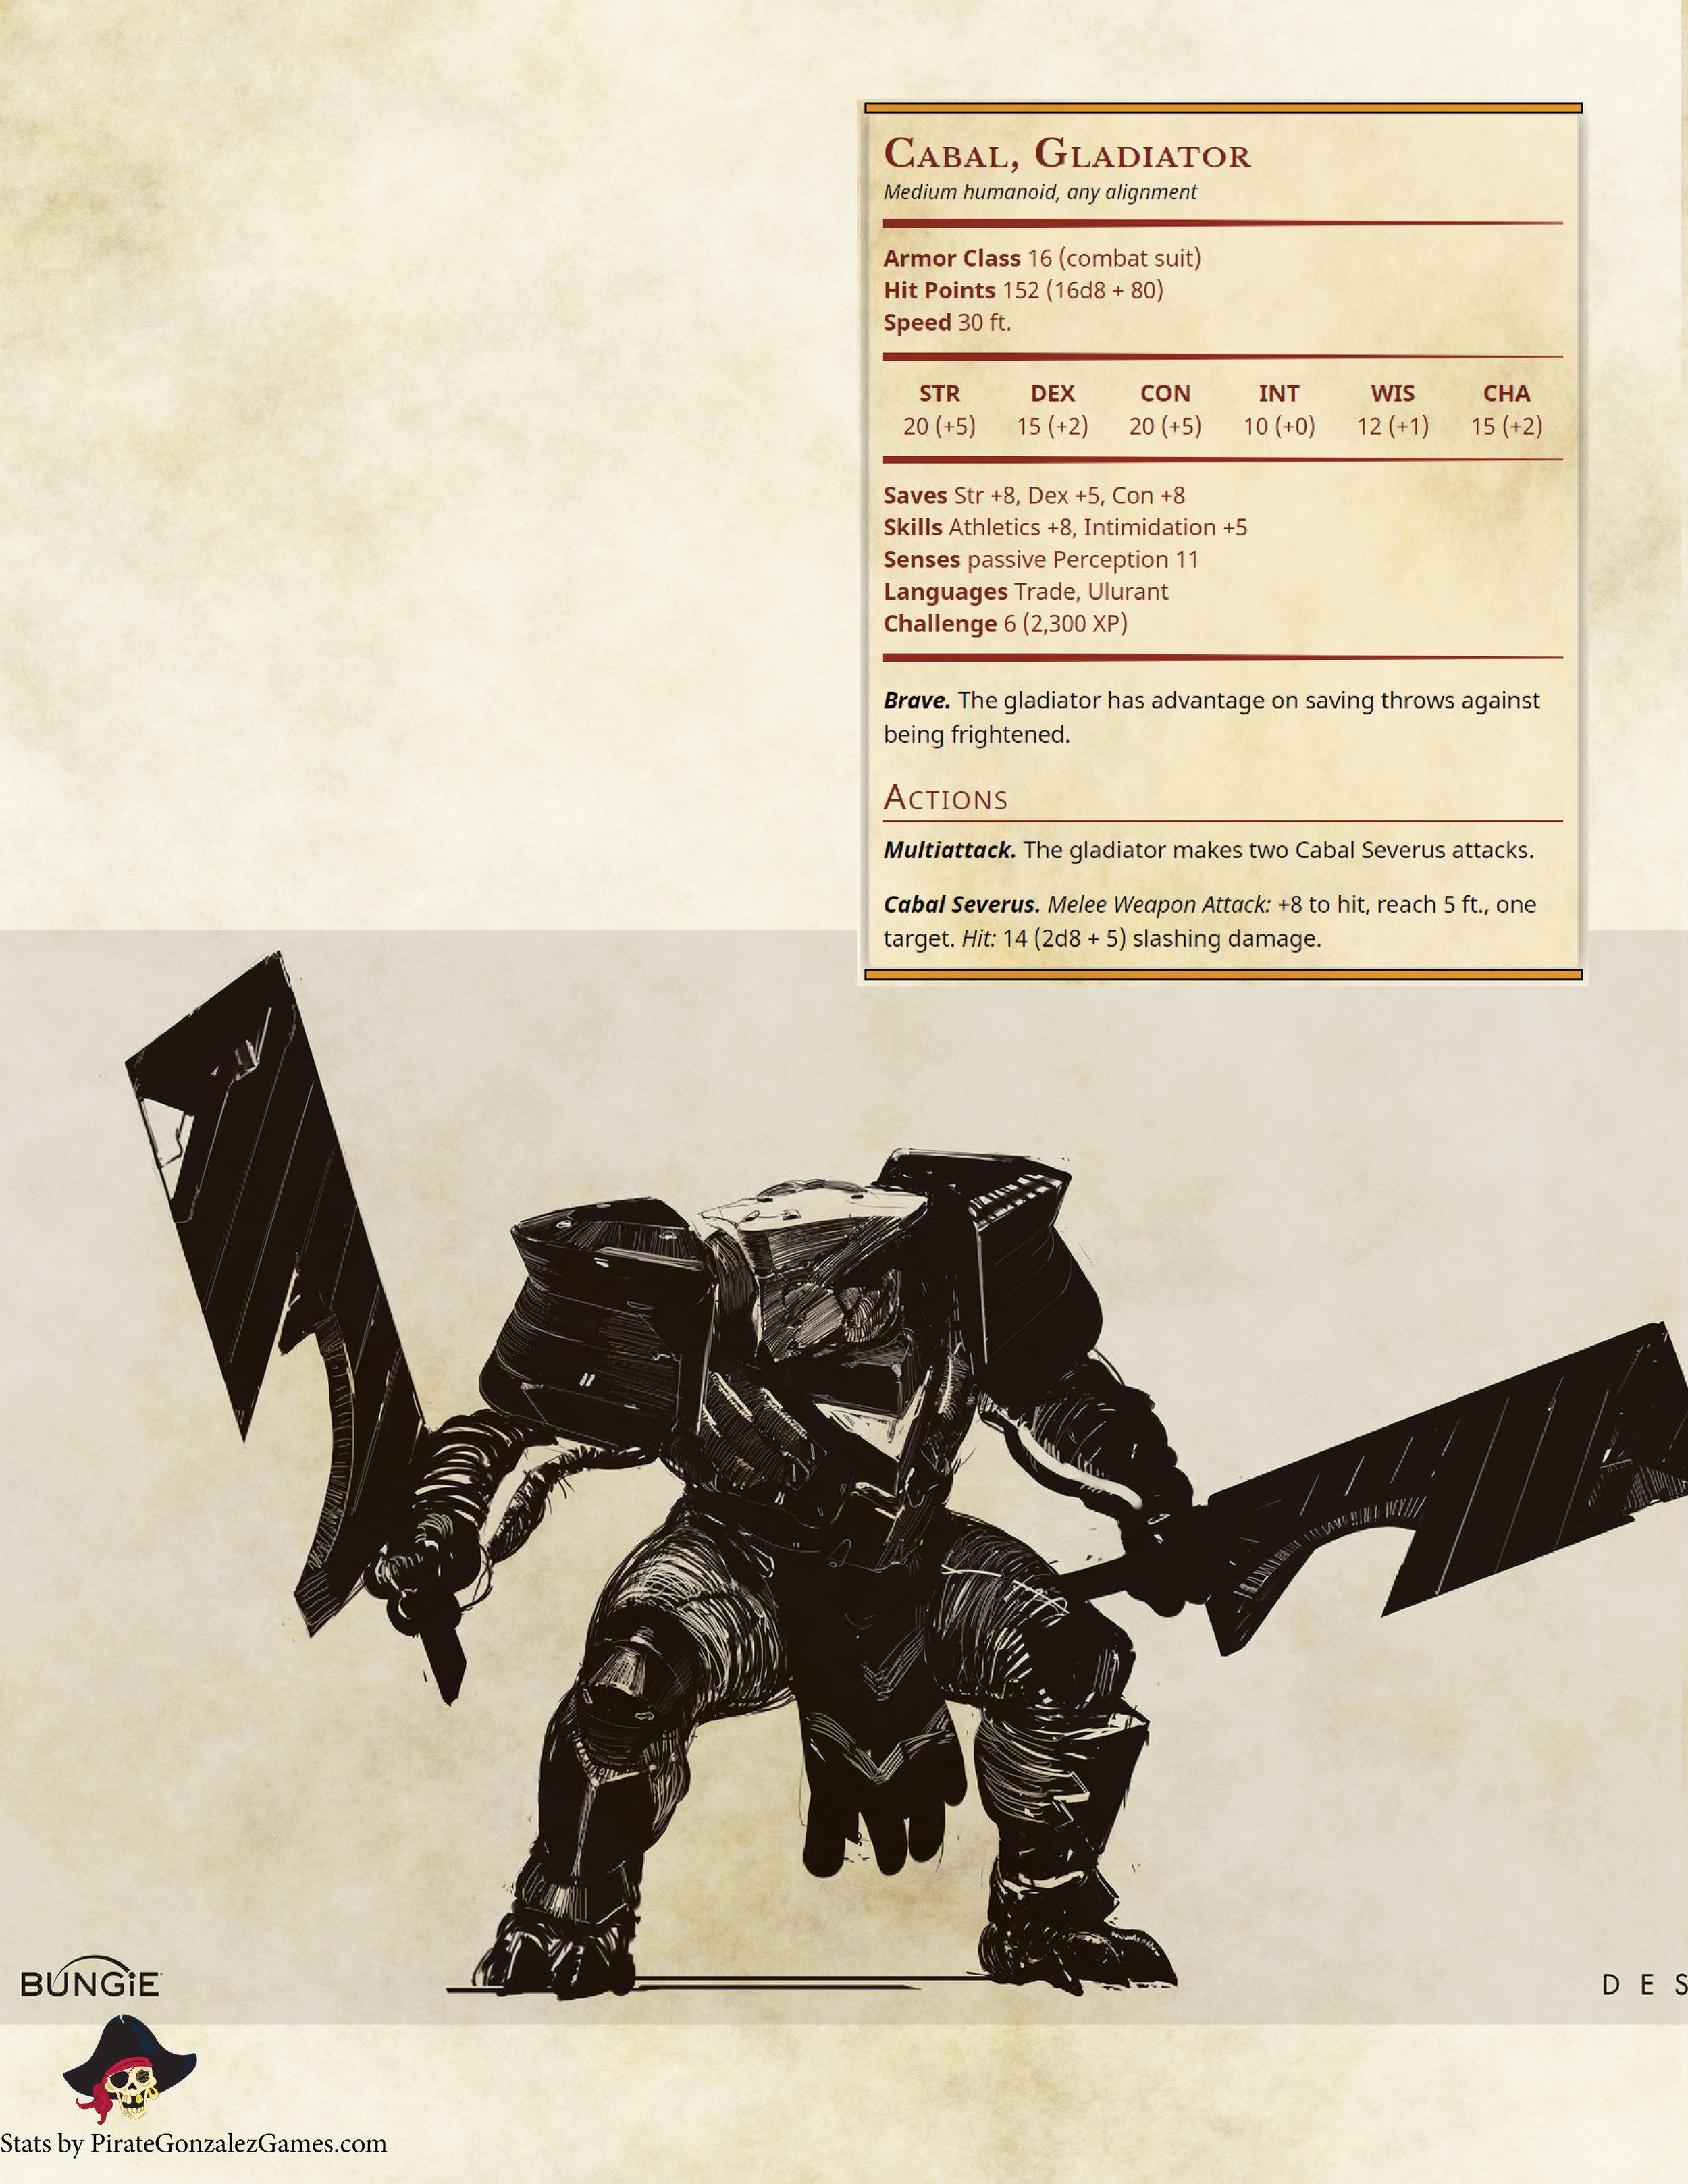 Cabal Gladiator